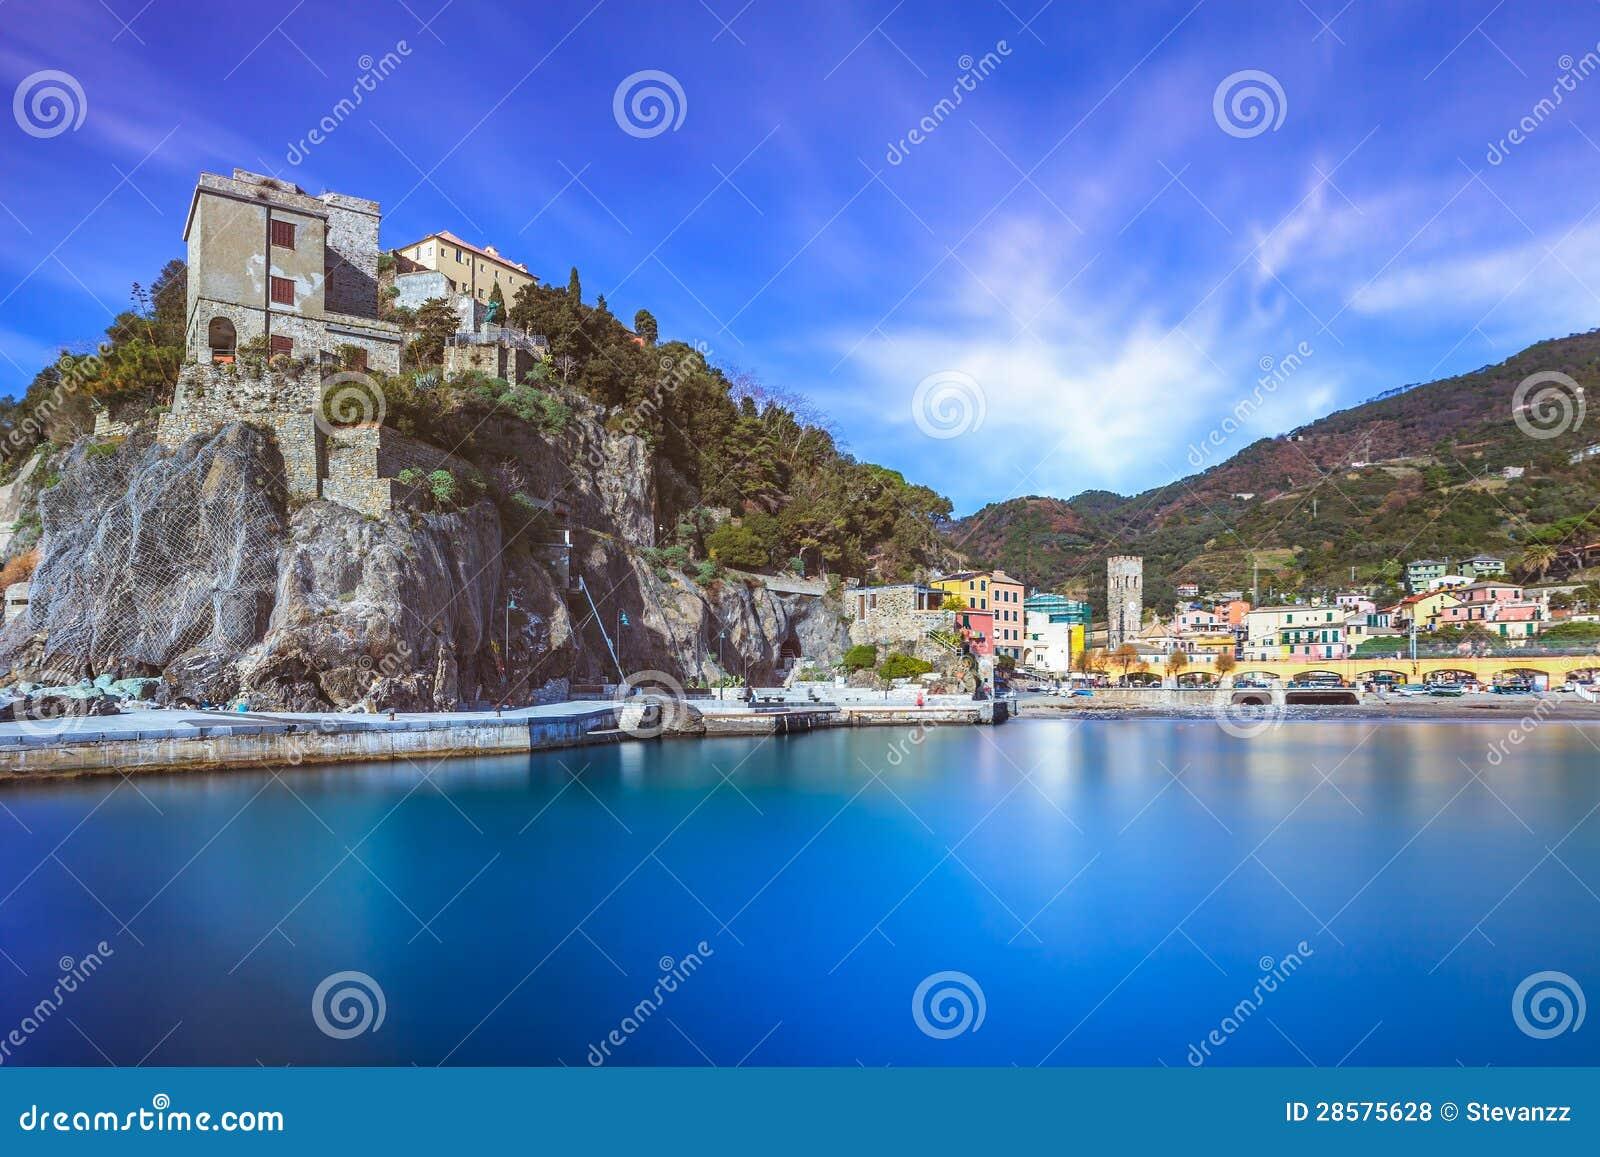 sea monterosso italy - photo #36